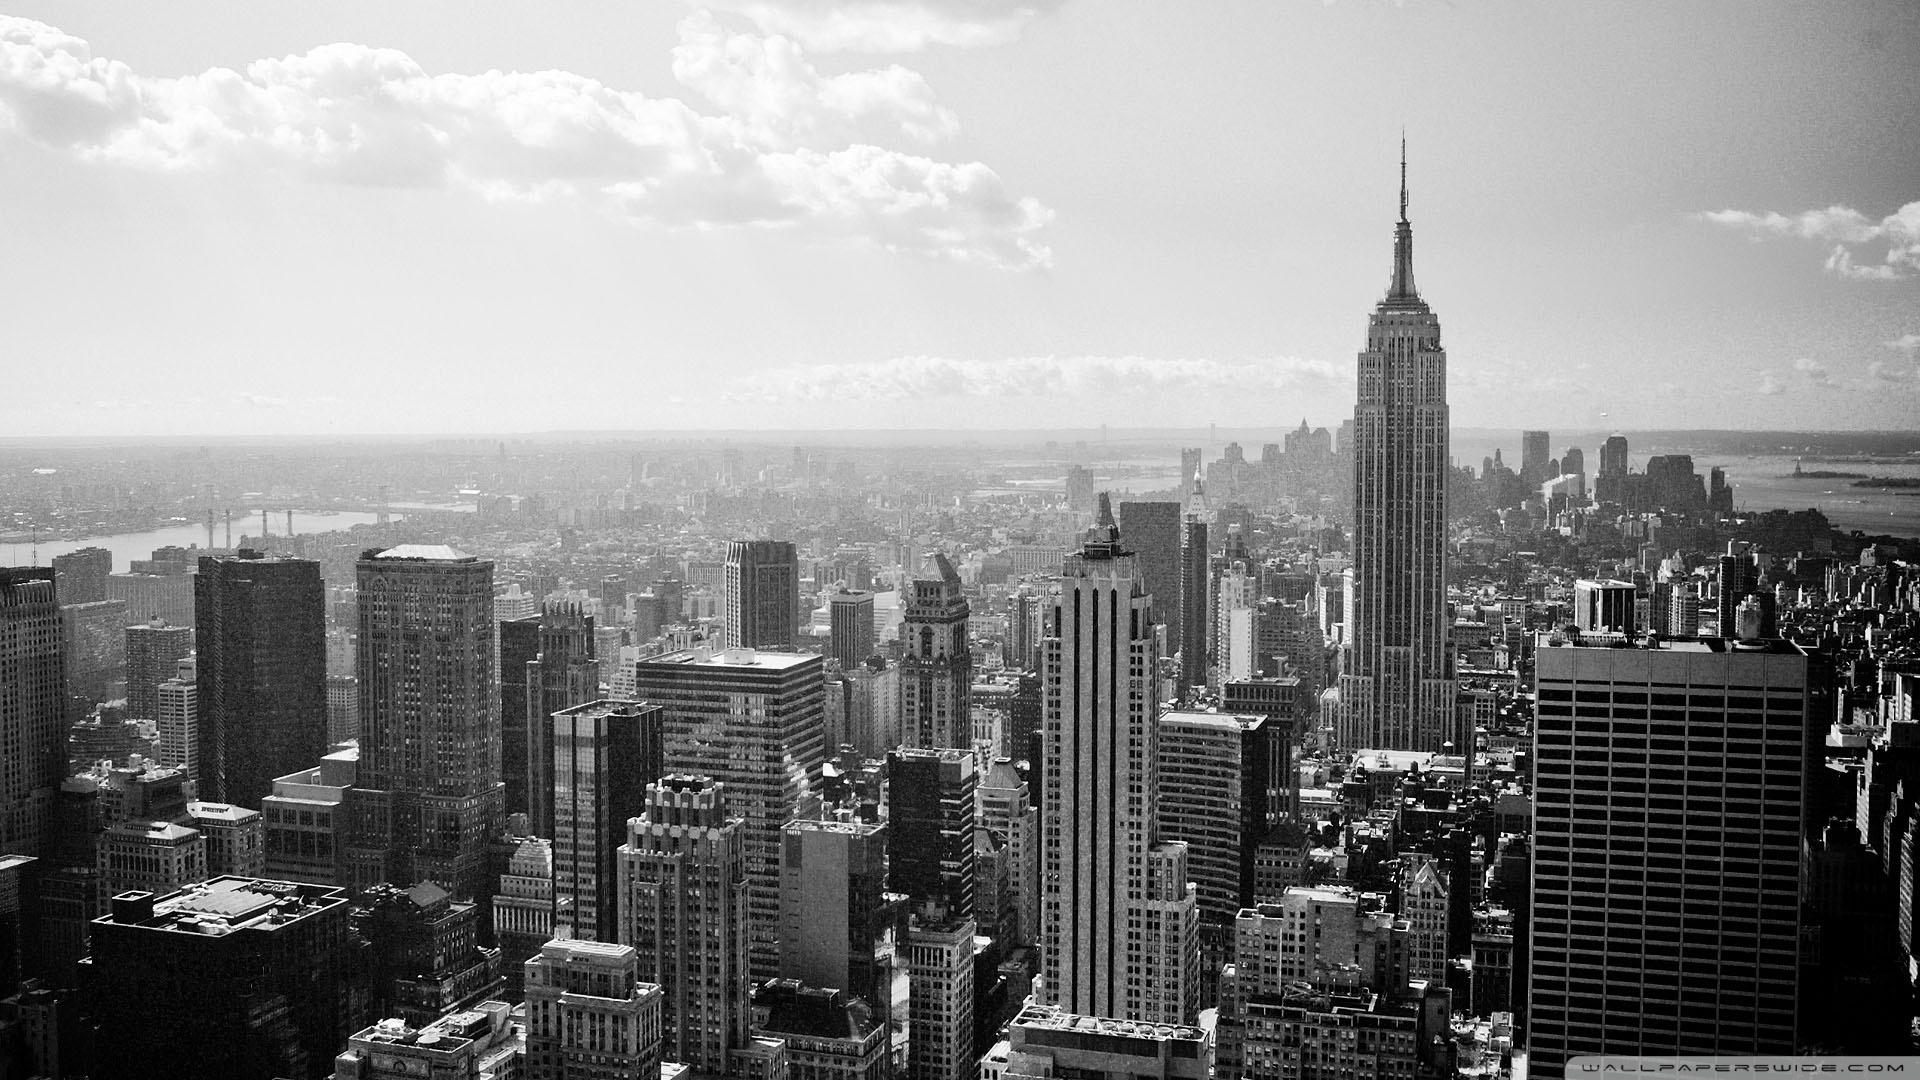 new york city ❤ 4k hd desktop wallpaper for 4k ultra hd tv • wide